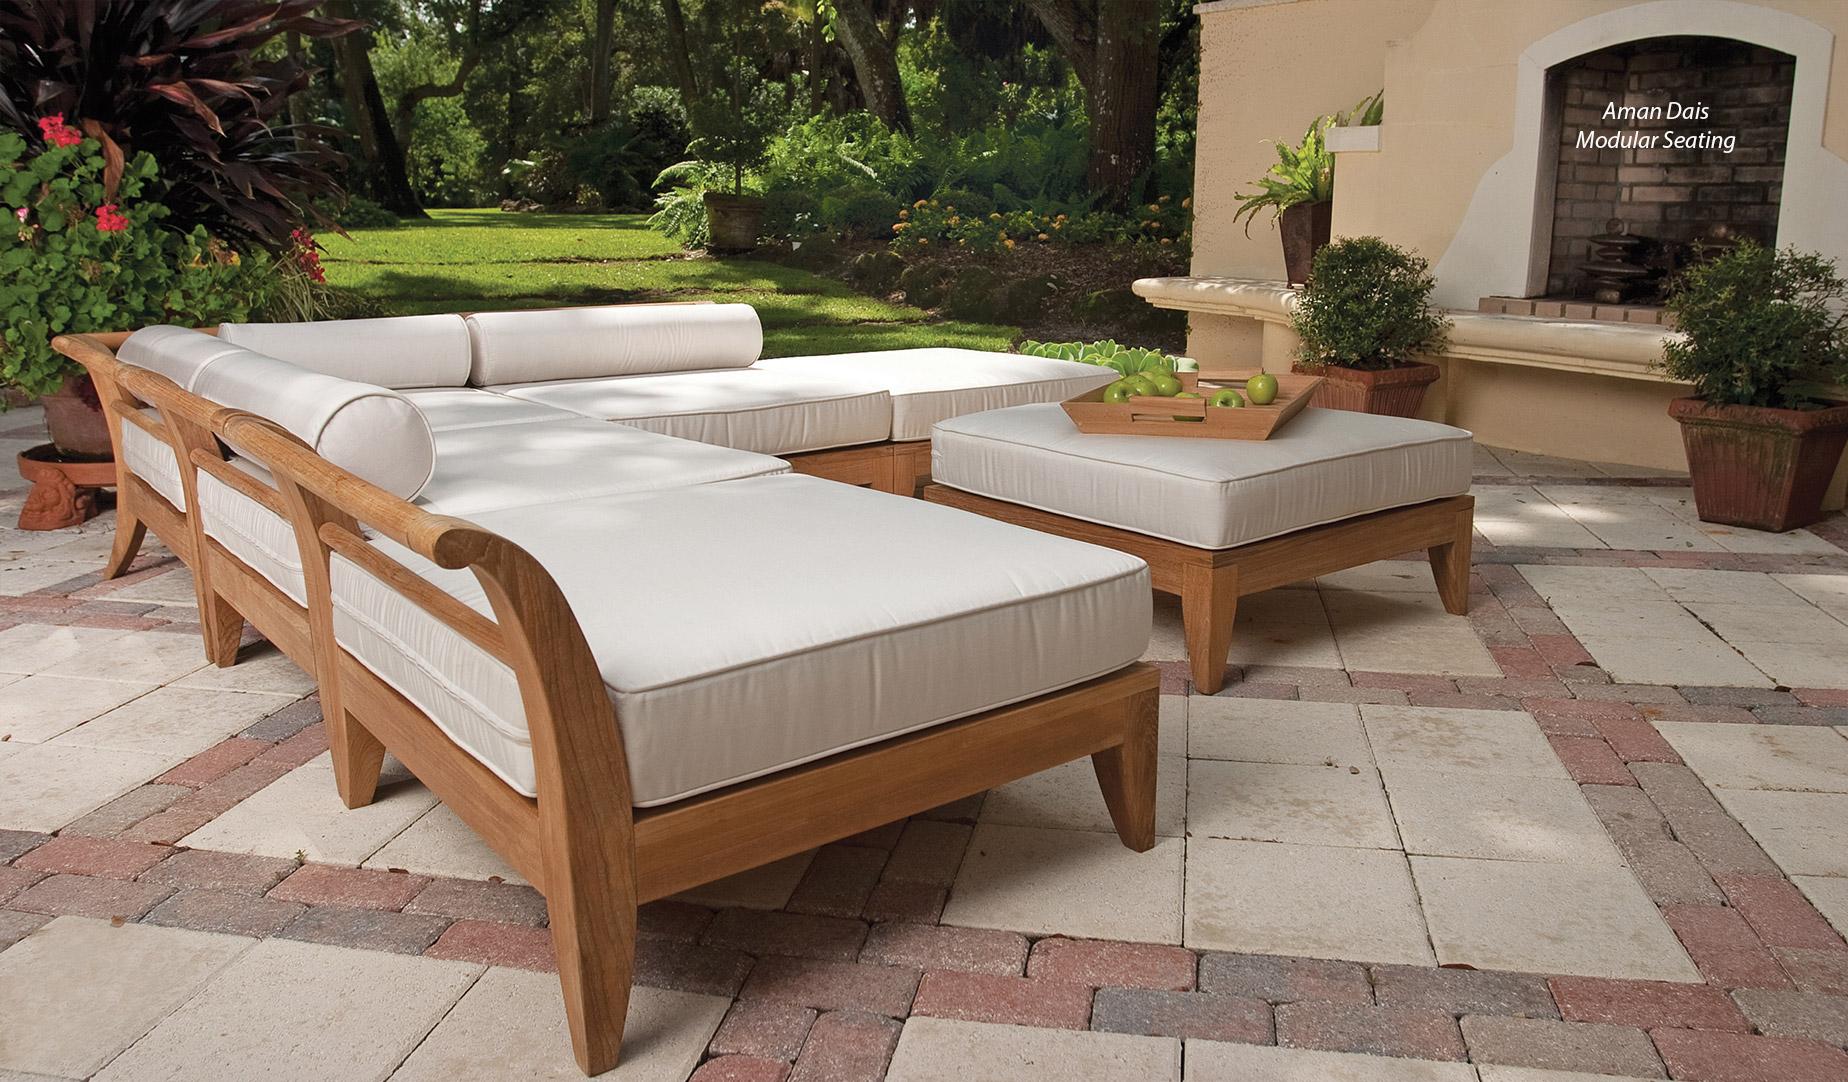 Teak garden furniture ... Teak furniture ... EKBKDBV